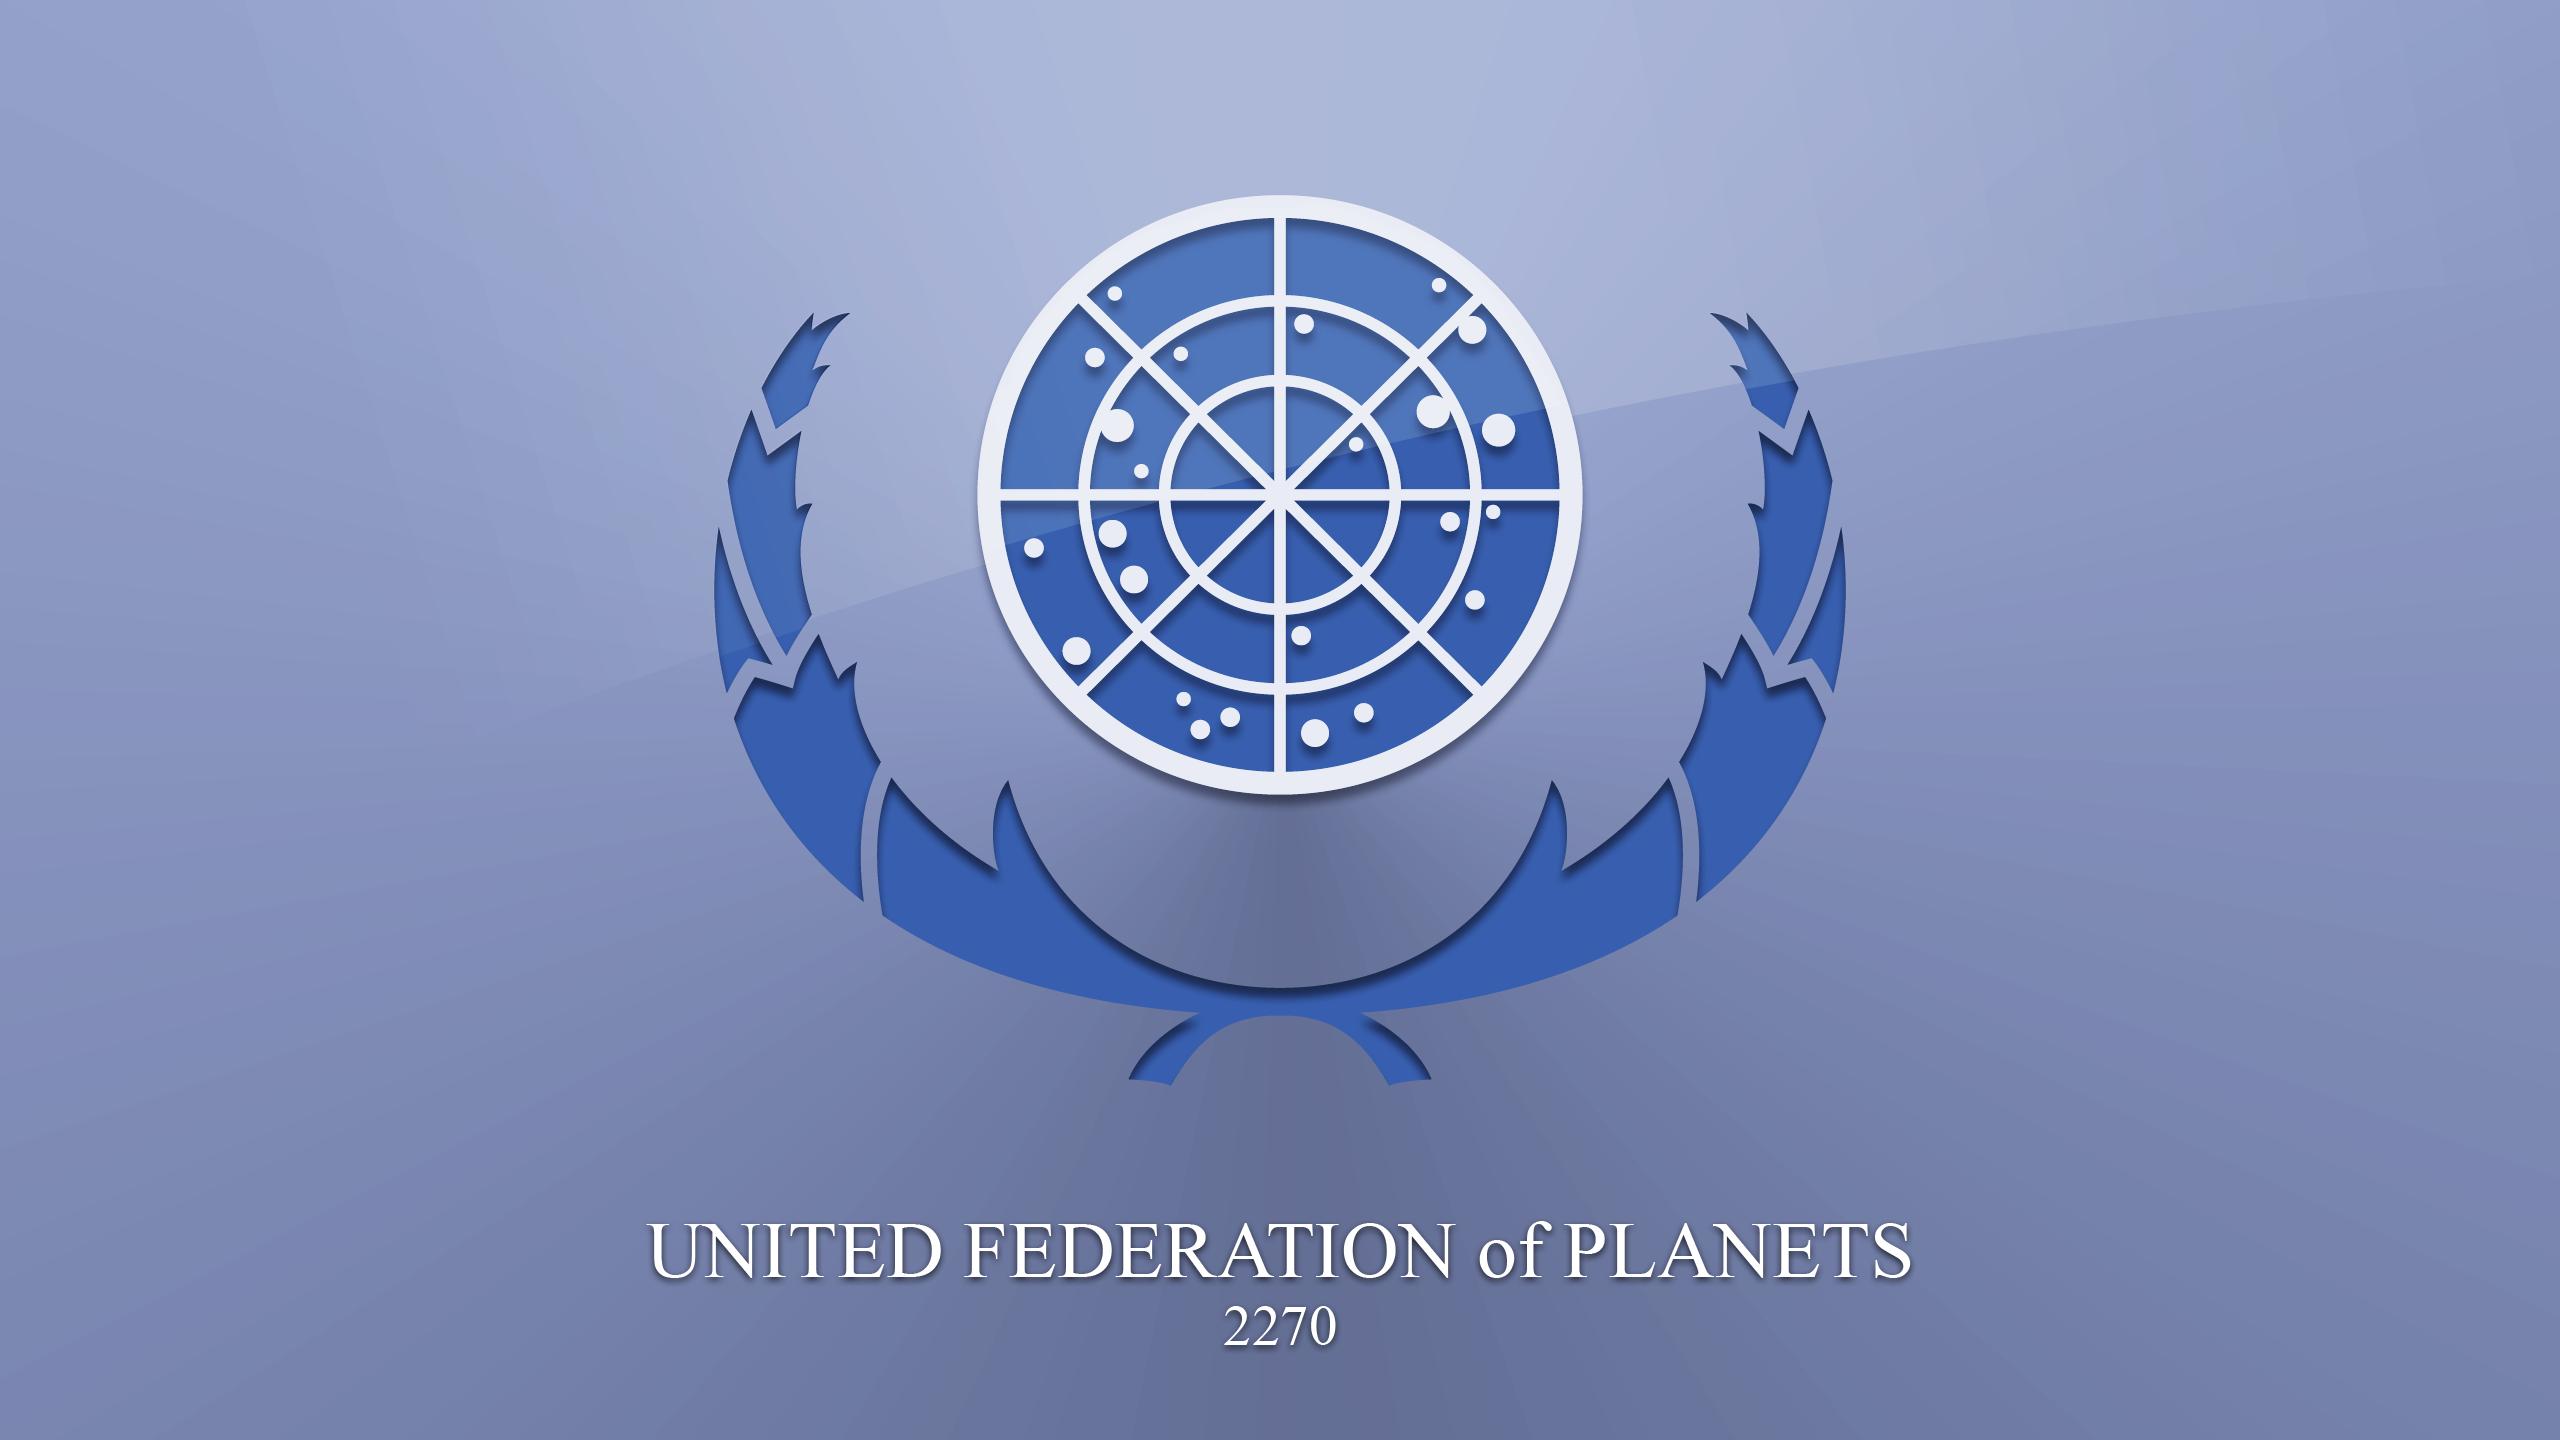 united federation of planets emblem - photo #9